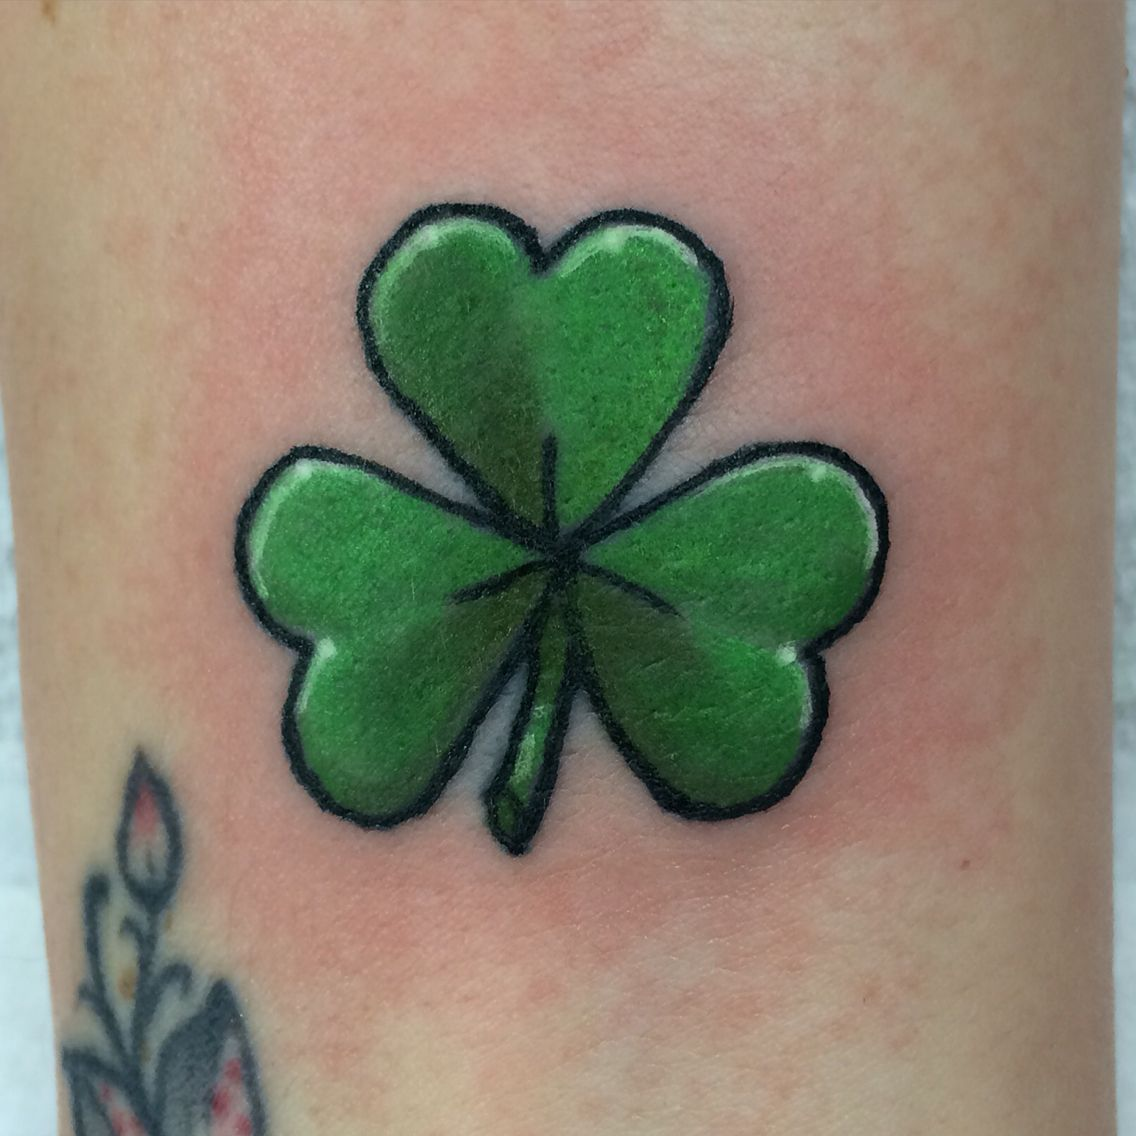 Shamrock tattoo tattoos pinterest shamrock tattoos for Clover tattoo meaning